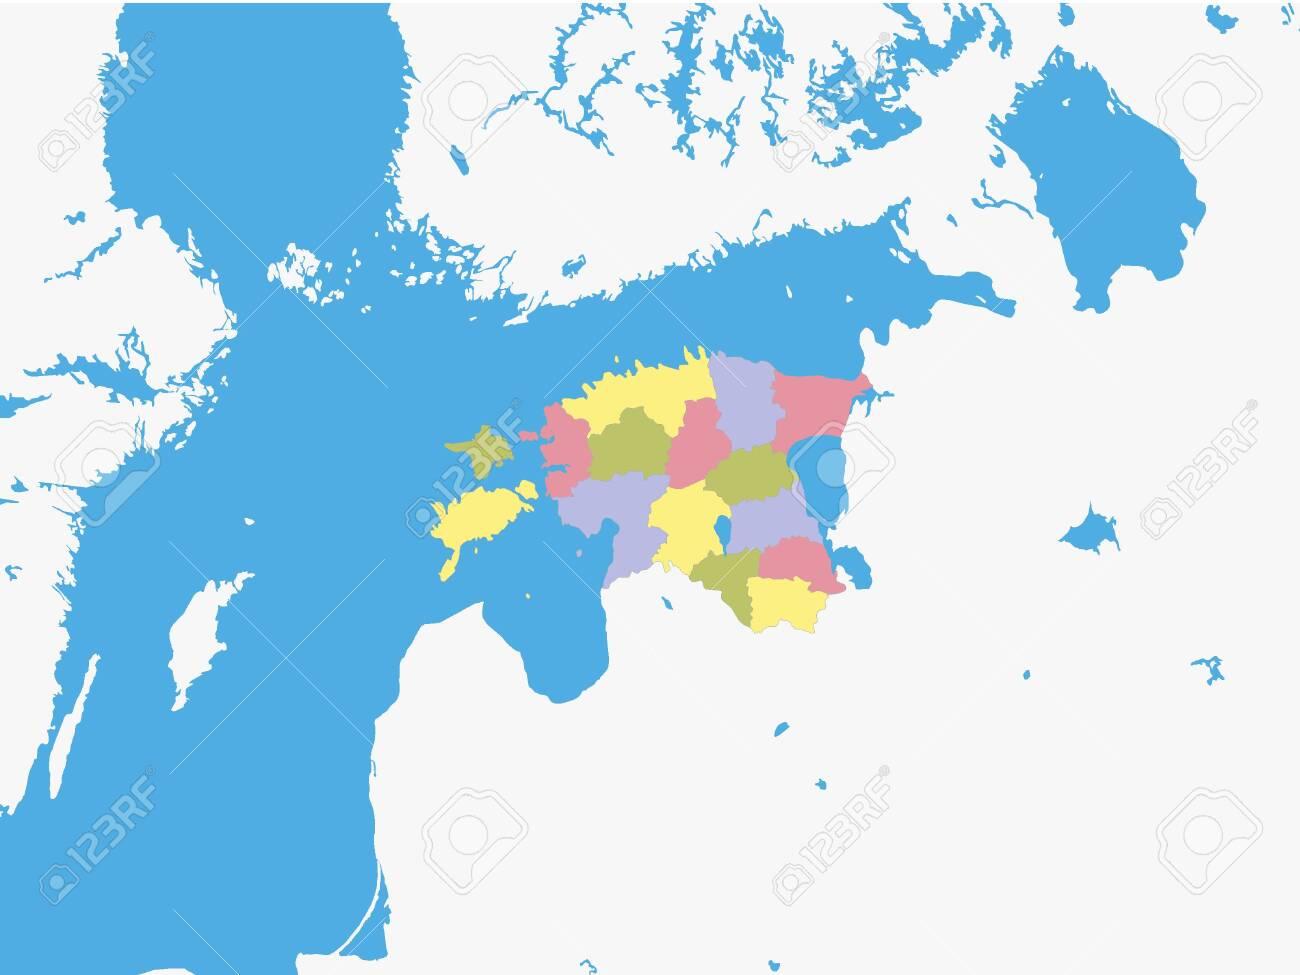 Map of Regions of Estonia with Surrounding Terrain - 133011228